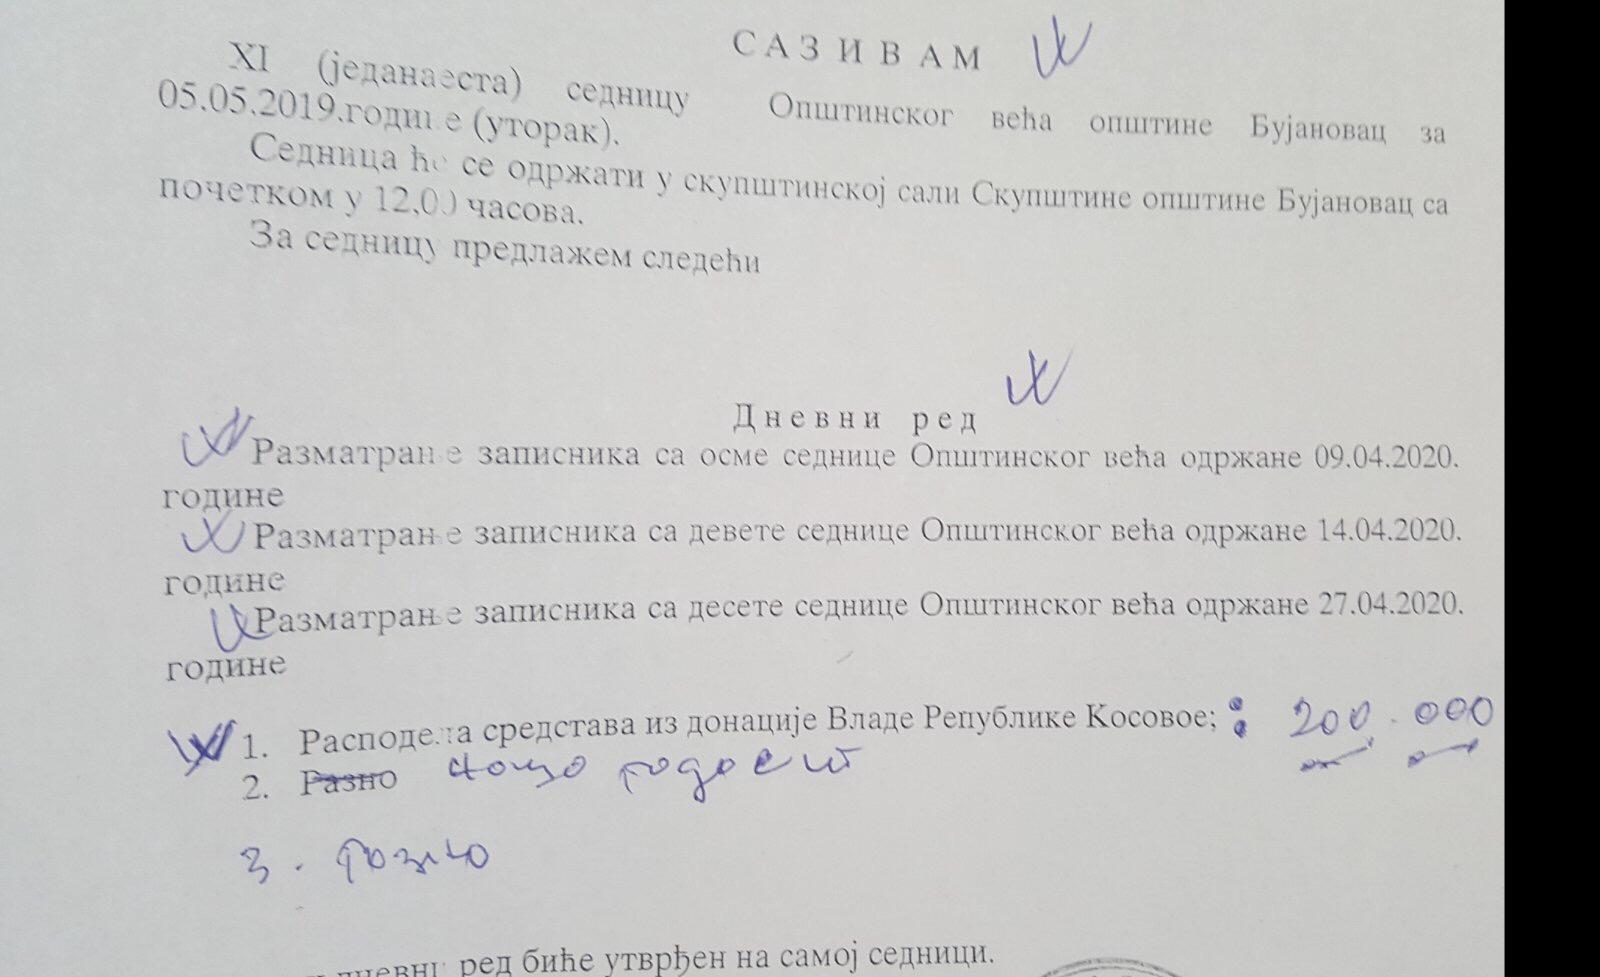 https://bujanovacke.co.rs/wordpress/wp-content/uploads/2020/05/IMG-6418.jpg